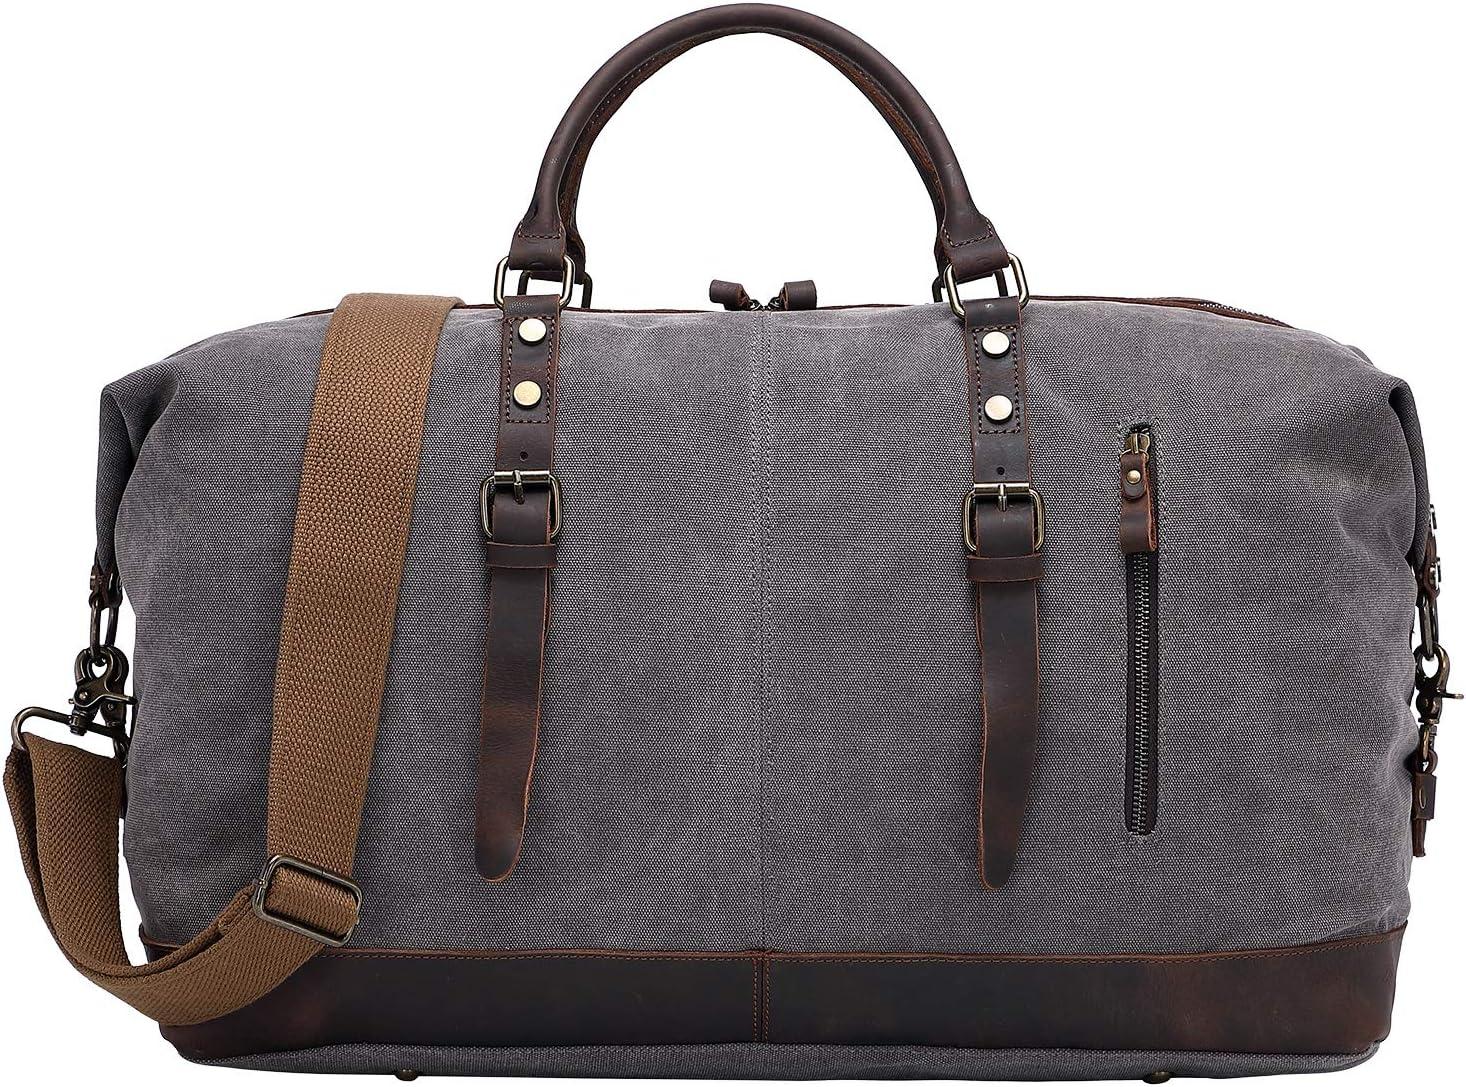 ALTOSY Canvas Duffel Bag Genuine Leather Travel Tote Duffle Shoulder Handbag Y2077, Grey